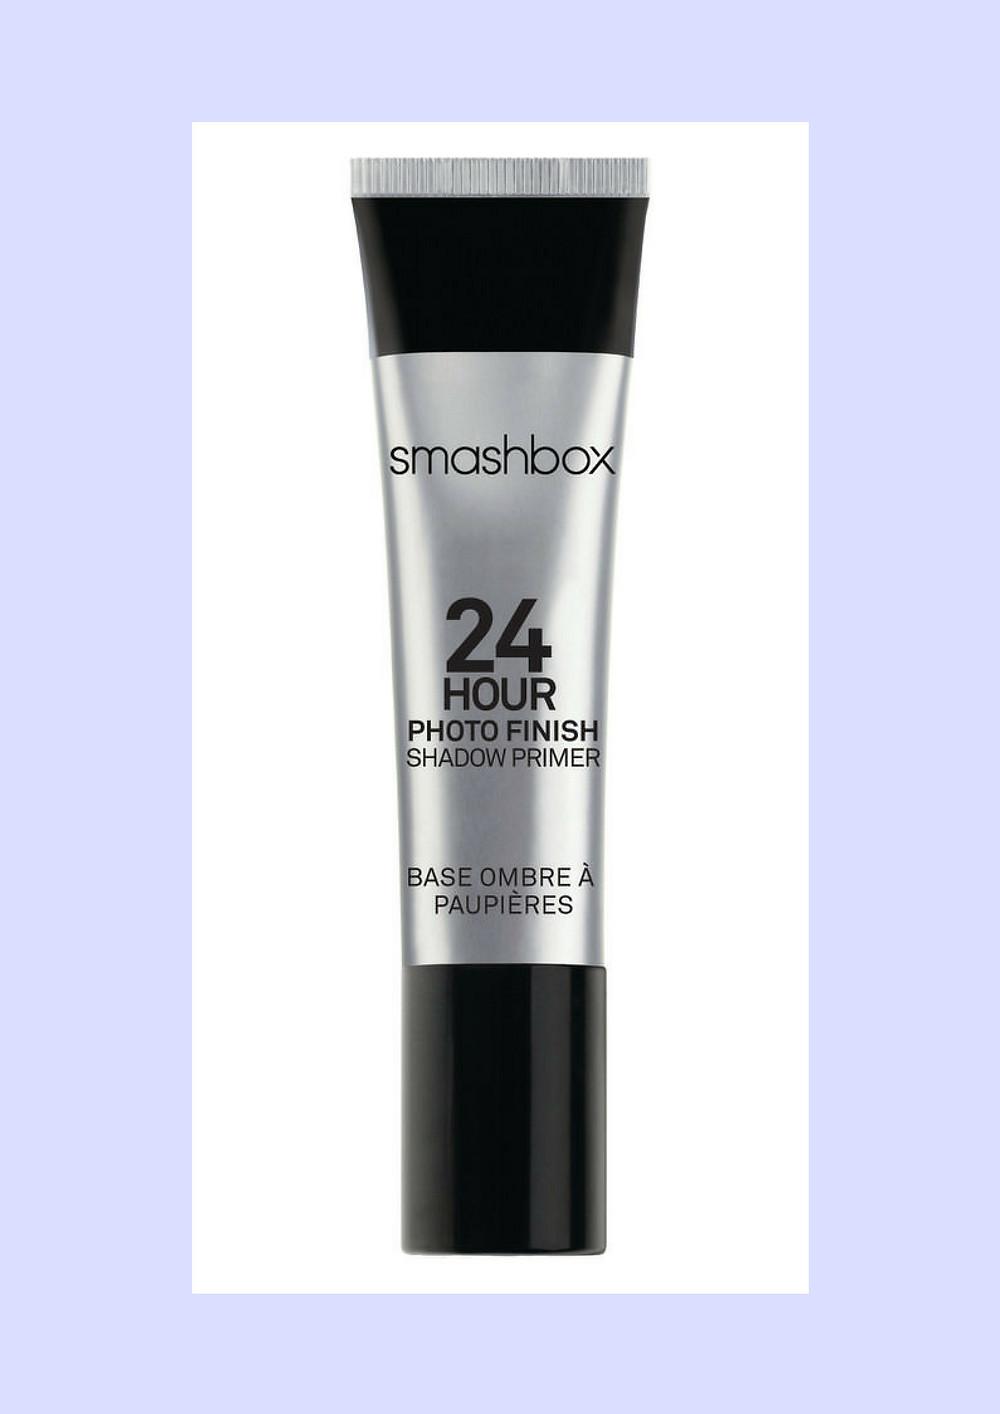 Smashbox Cosmetics 24 Hour Shadow Primer